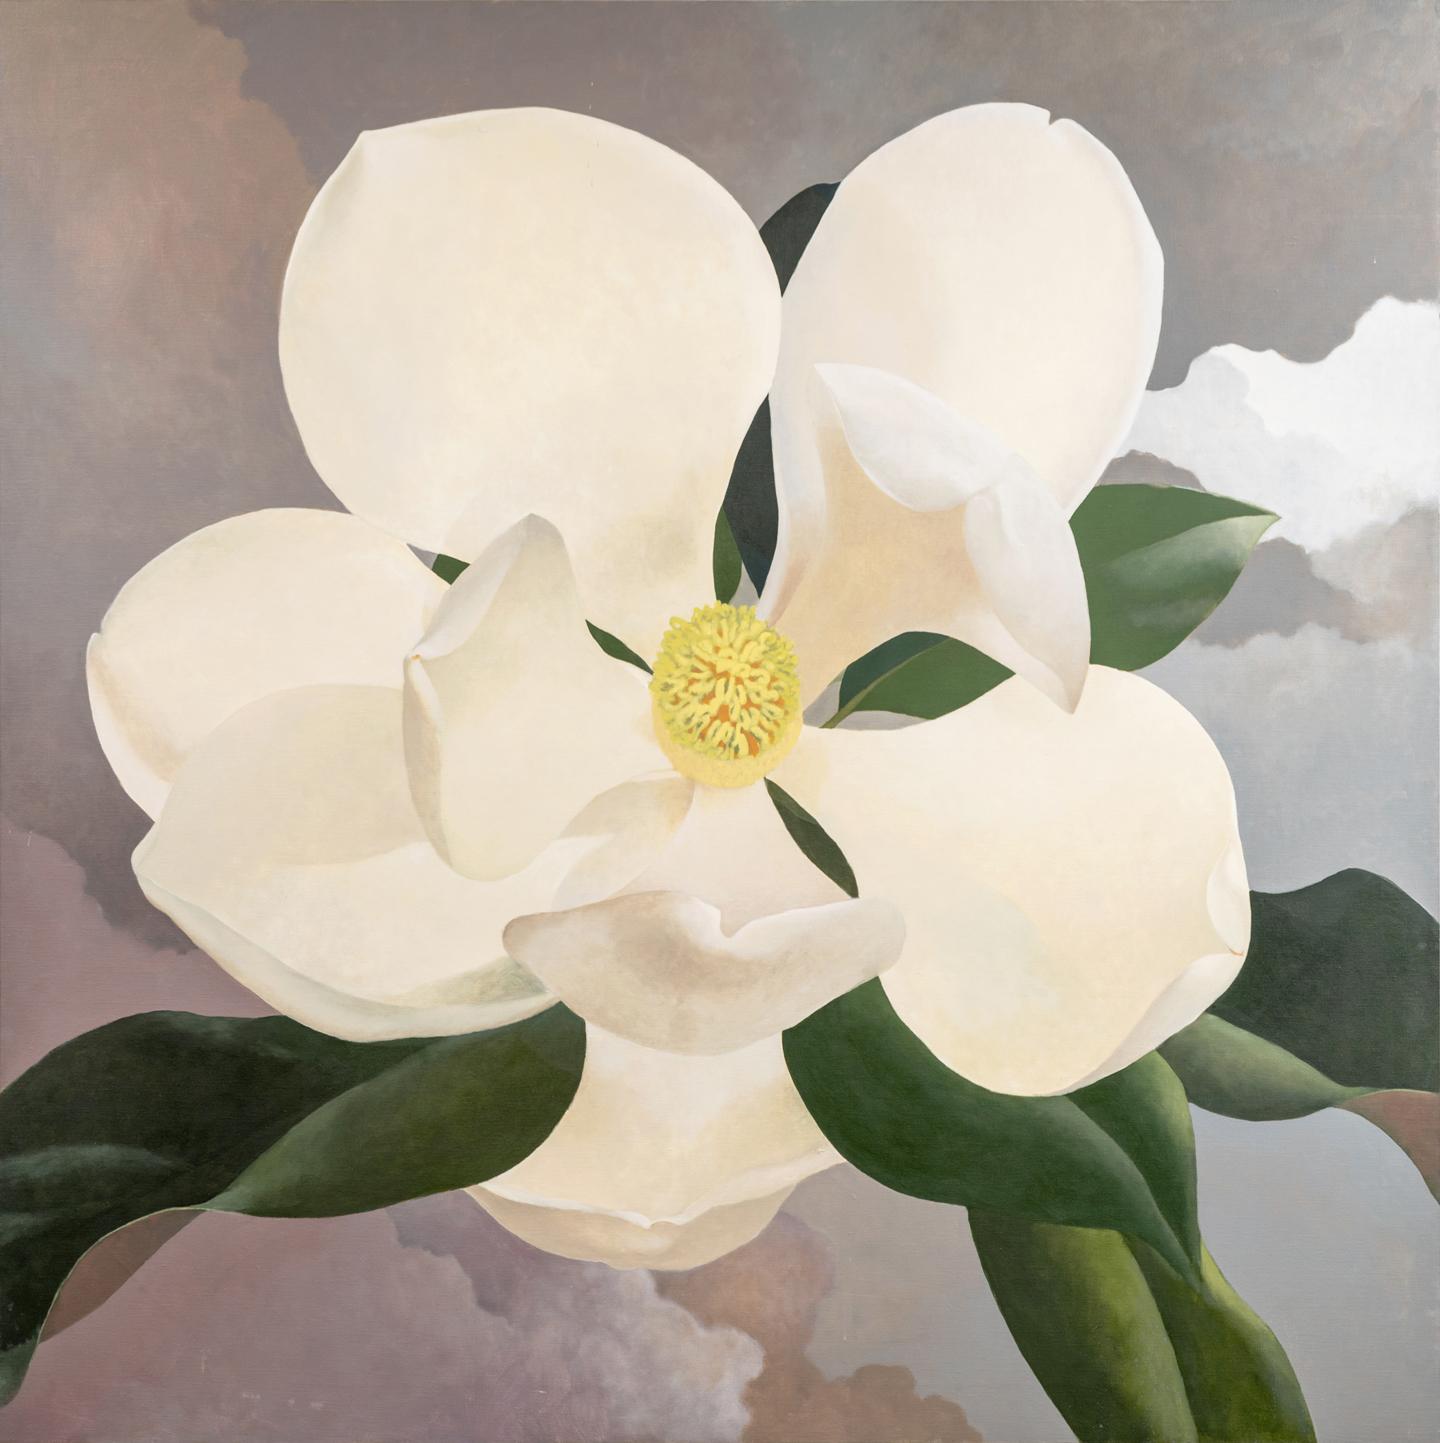 Magnolia, James Blake